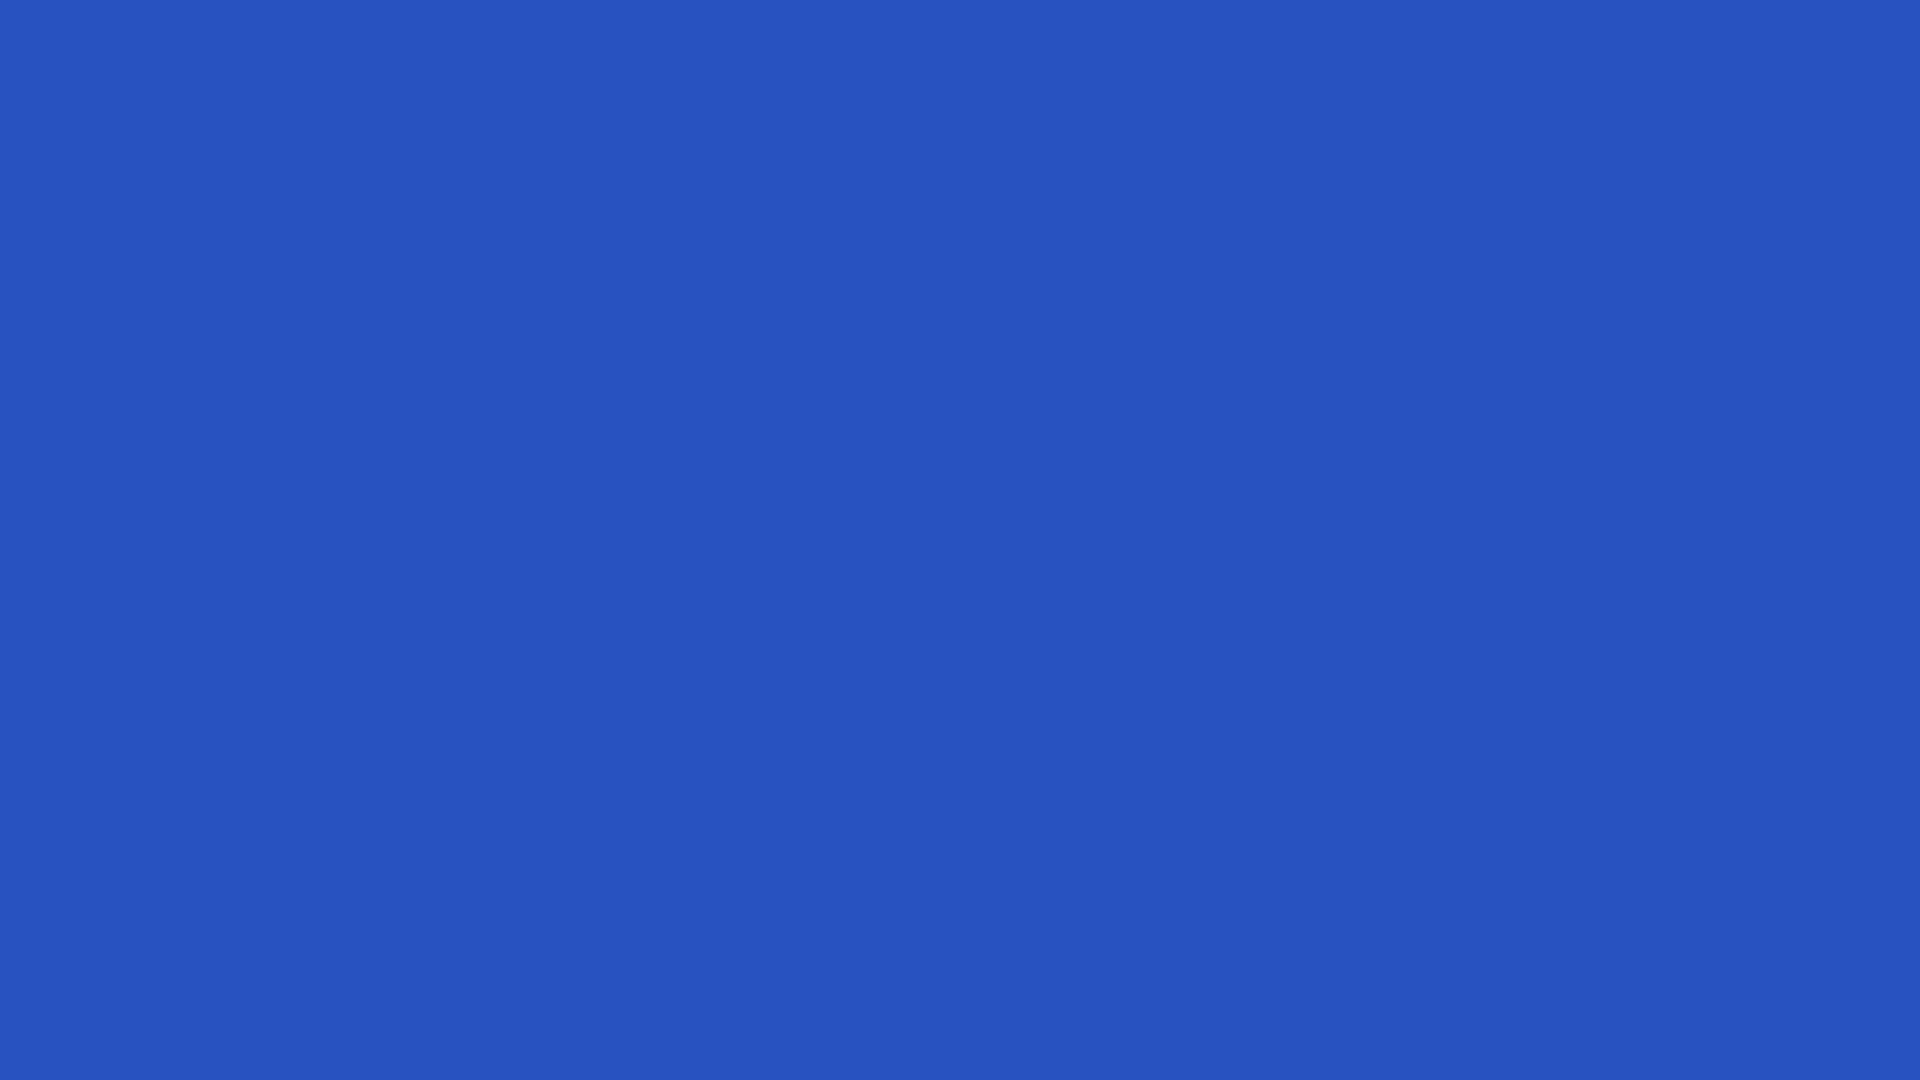 Dark Images Wallpaper Hd 1920x1080 Cerulean Blue Solid Color Background